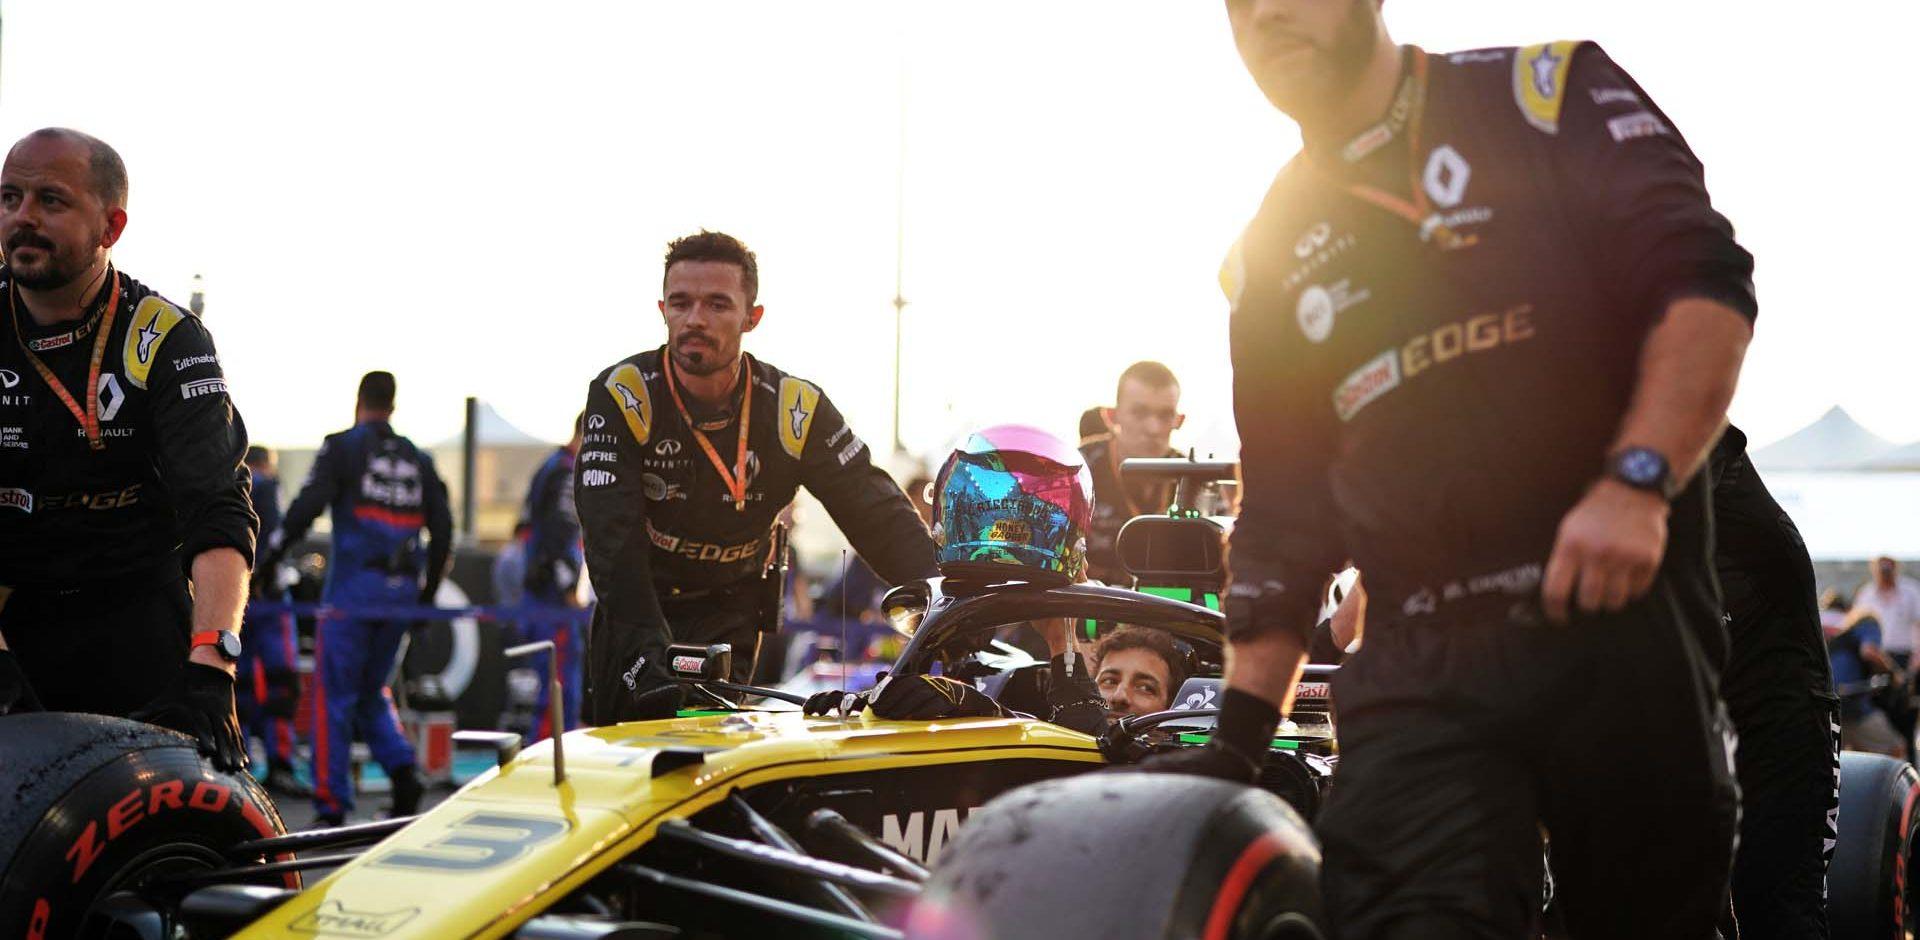 Daniel Ricciardo (AUS) Renault F1 Team RS19 on the grid. Abu Dhabi Grand Prix, Sunday 1st December 2019. Yas Marina Circuit, Abu Dhabi, UAE.